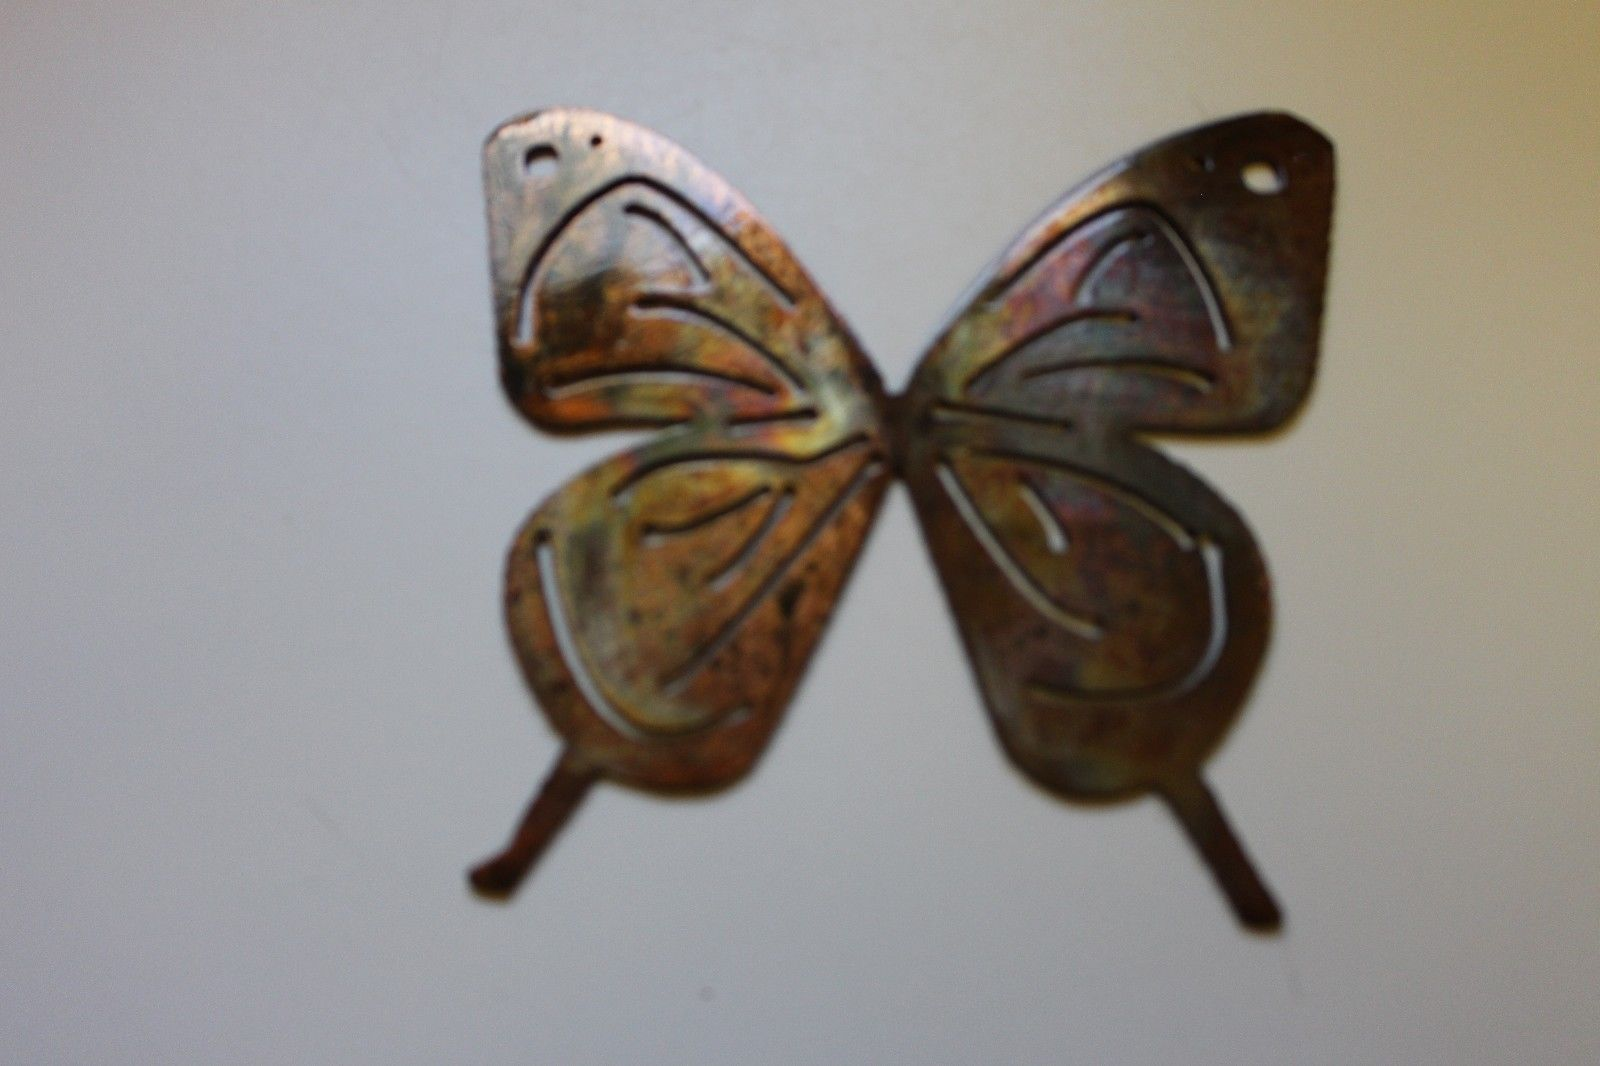 small butterfly 5 metal wall art decor copper bronze wall sculptures. Black Bedroom Furniture Sets. Home Design Ideas